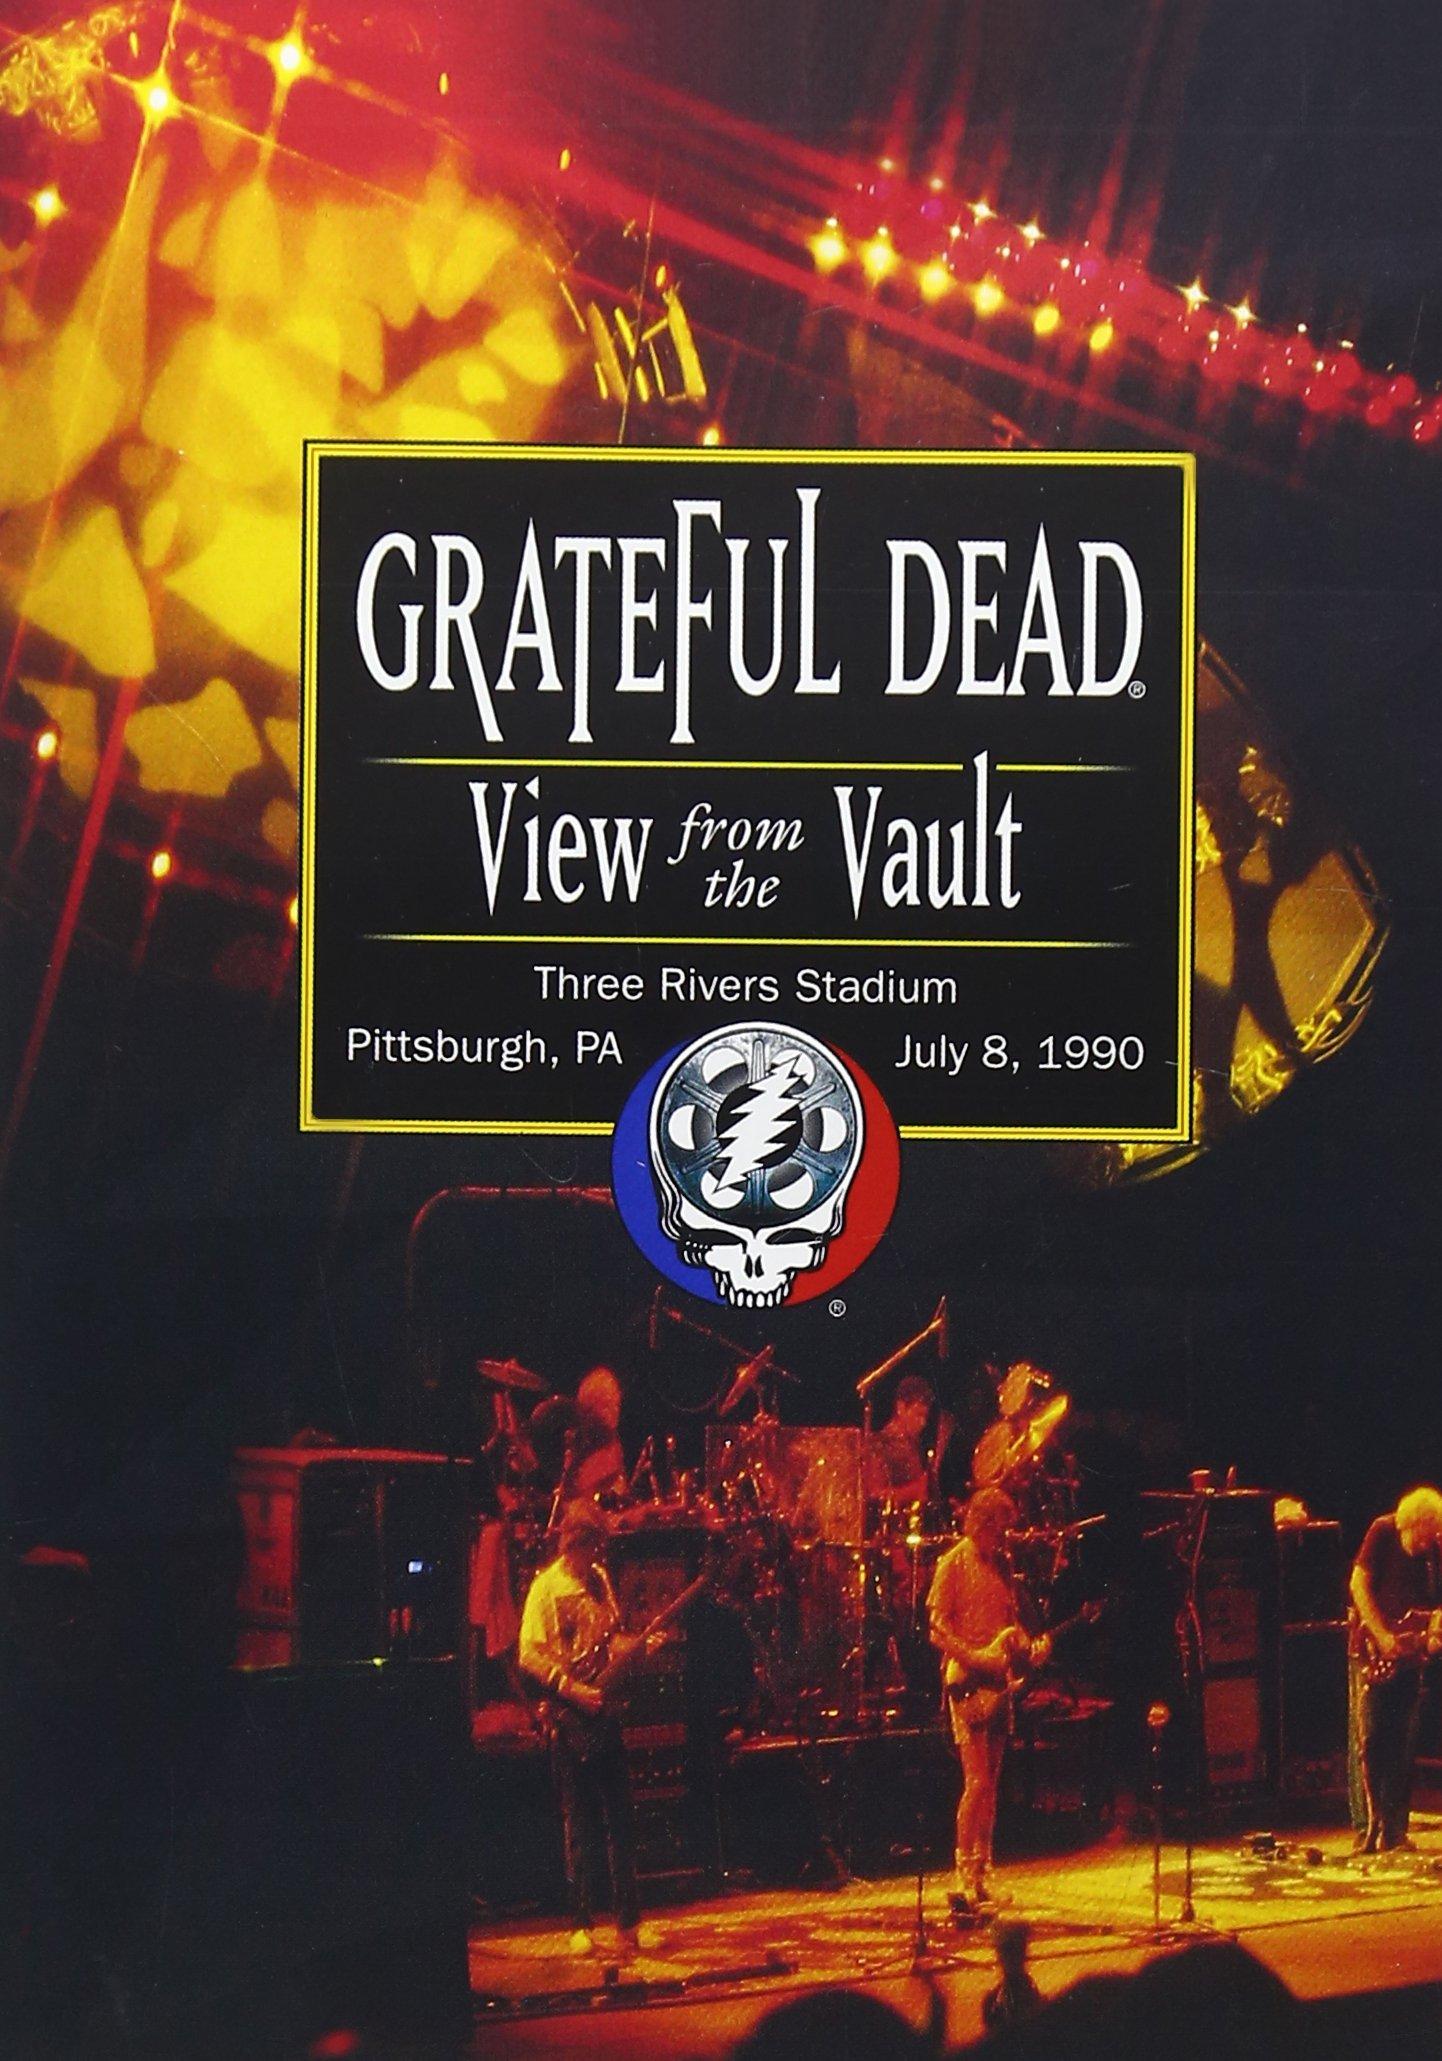 DVD : Grateful Dead - The Grateful Dead: View From The Vault (DVD)